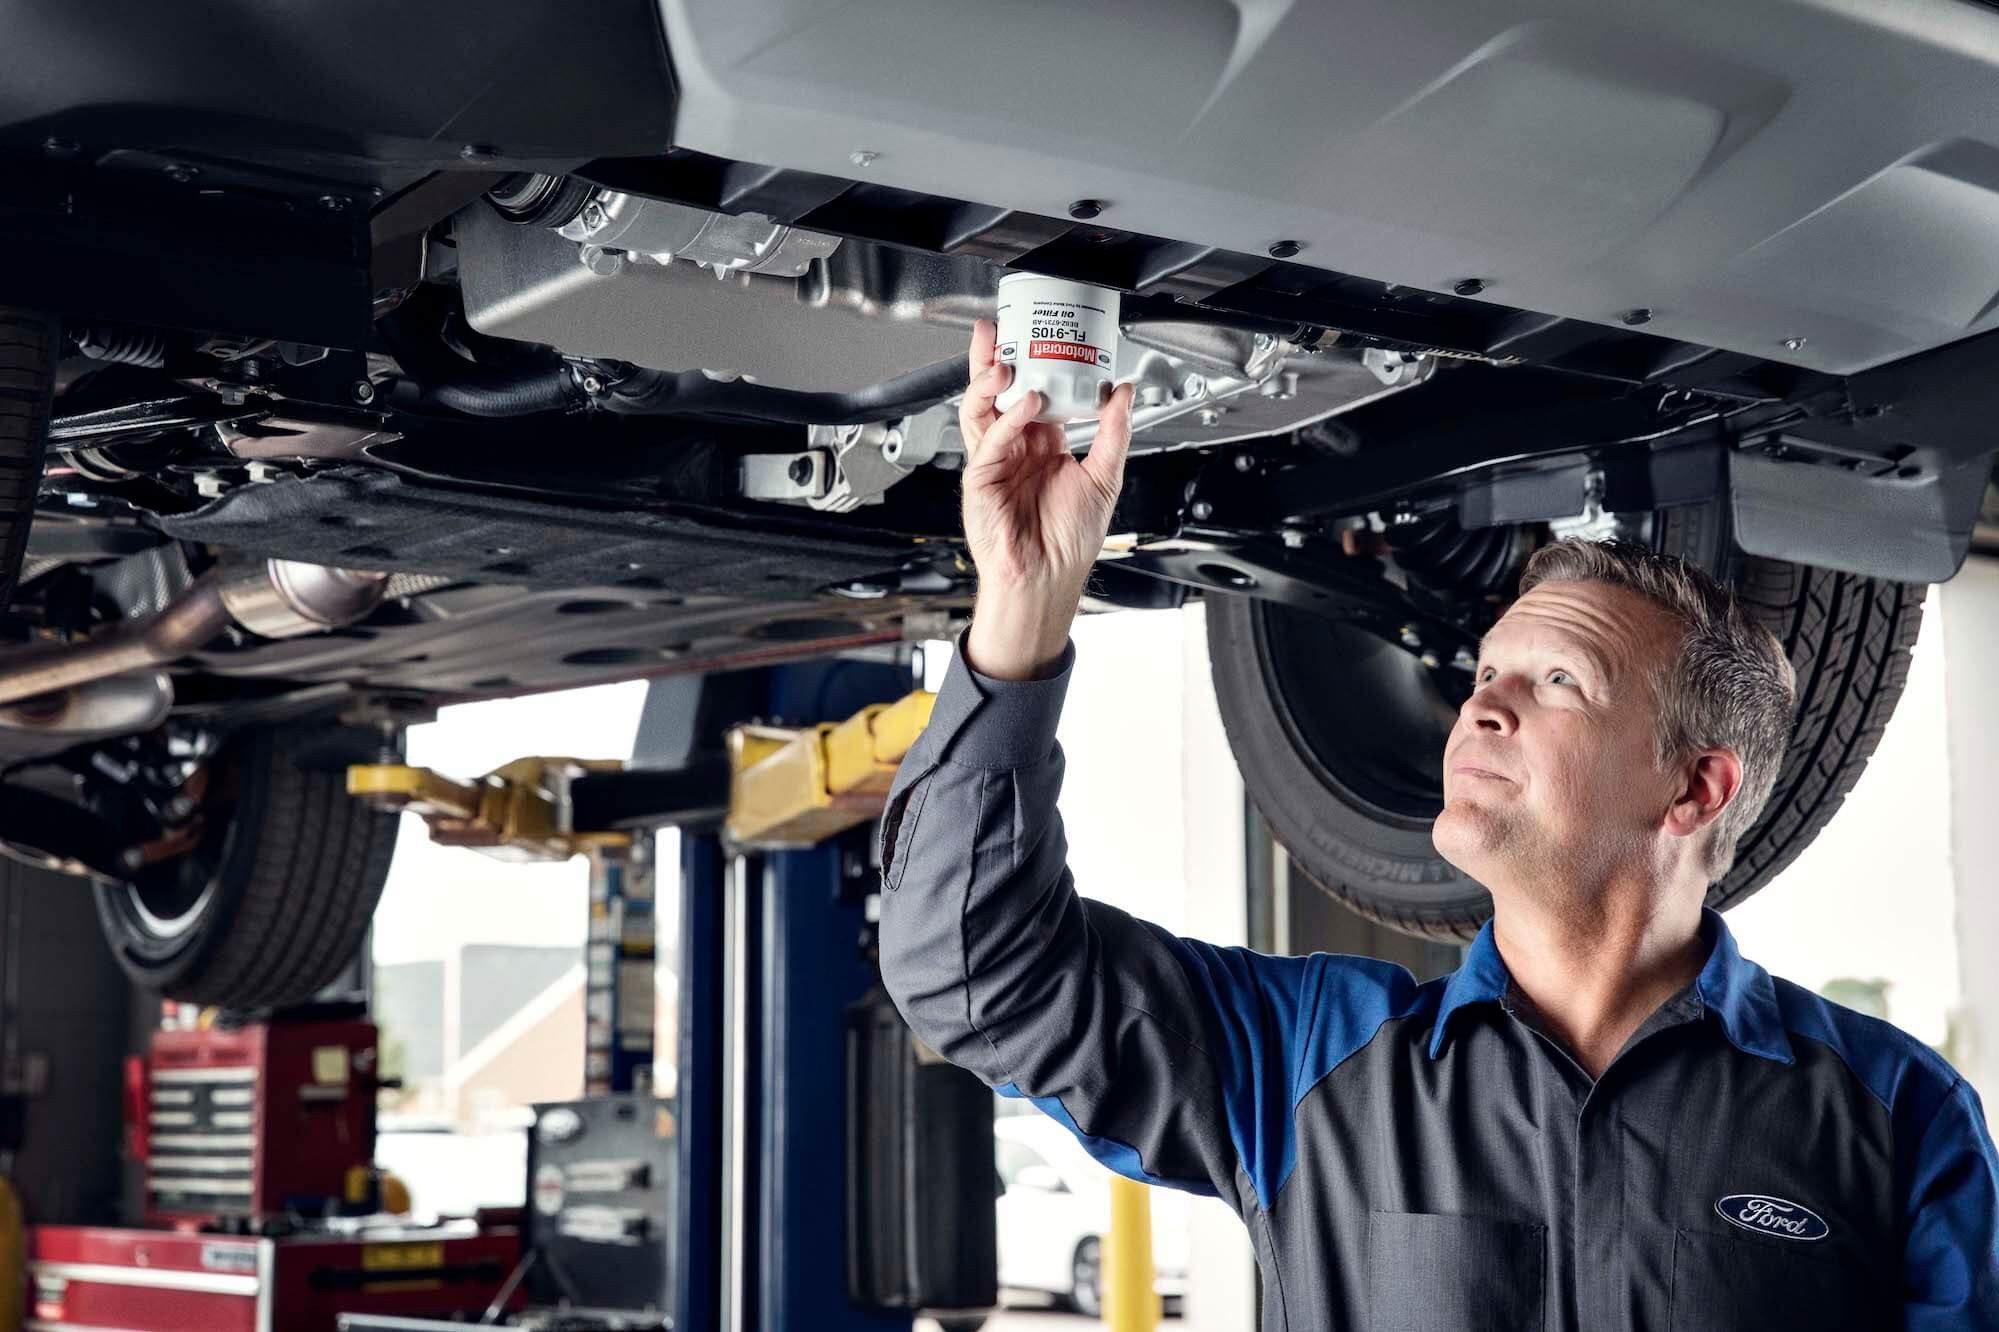 Quick Lane - Service Technician Replacing Oil Filter